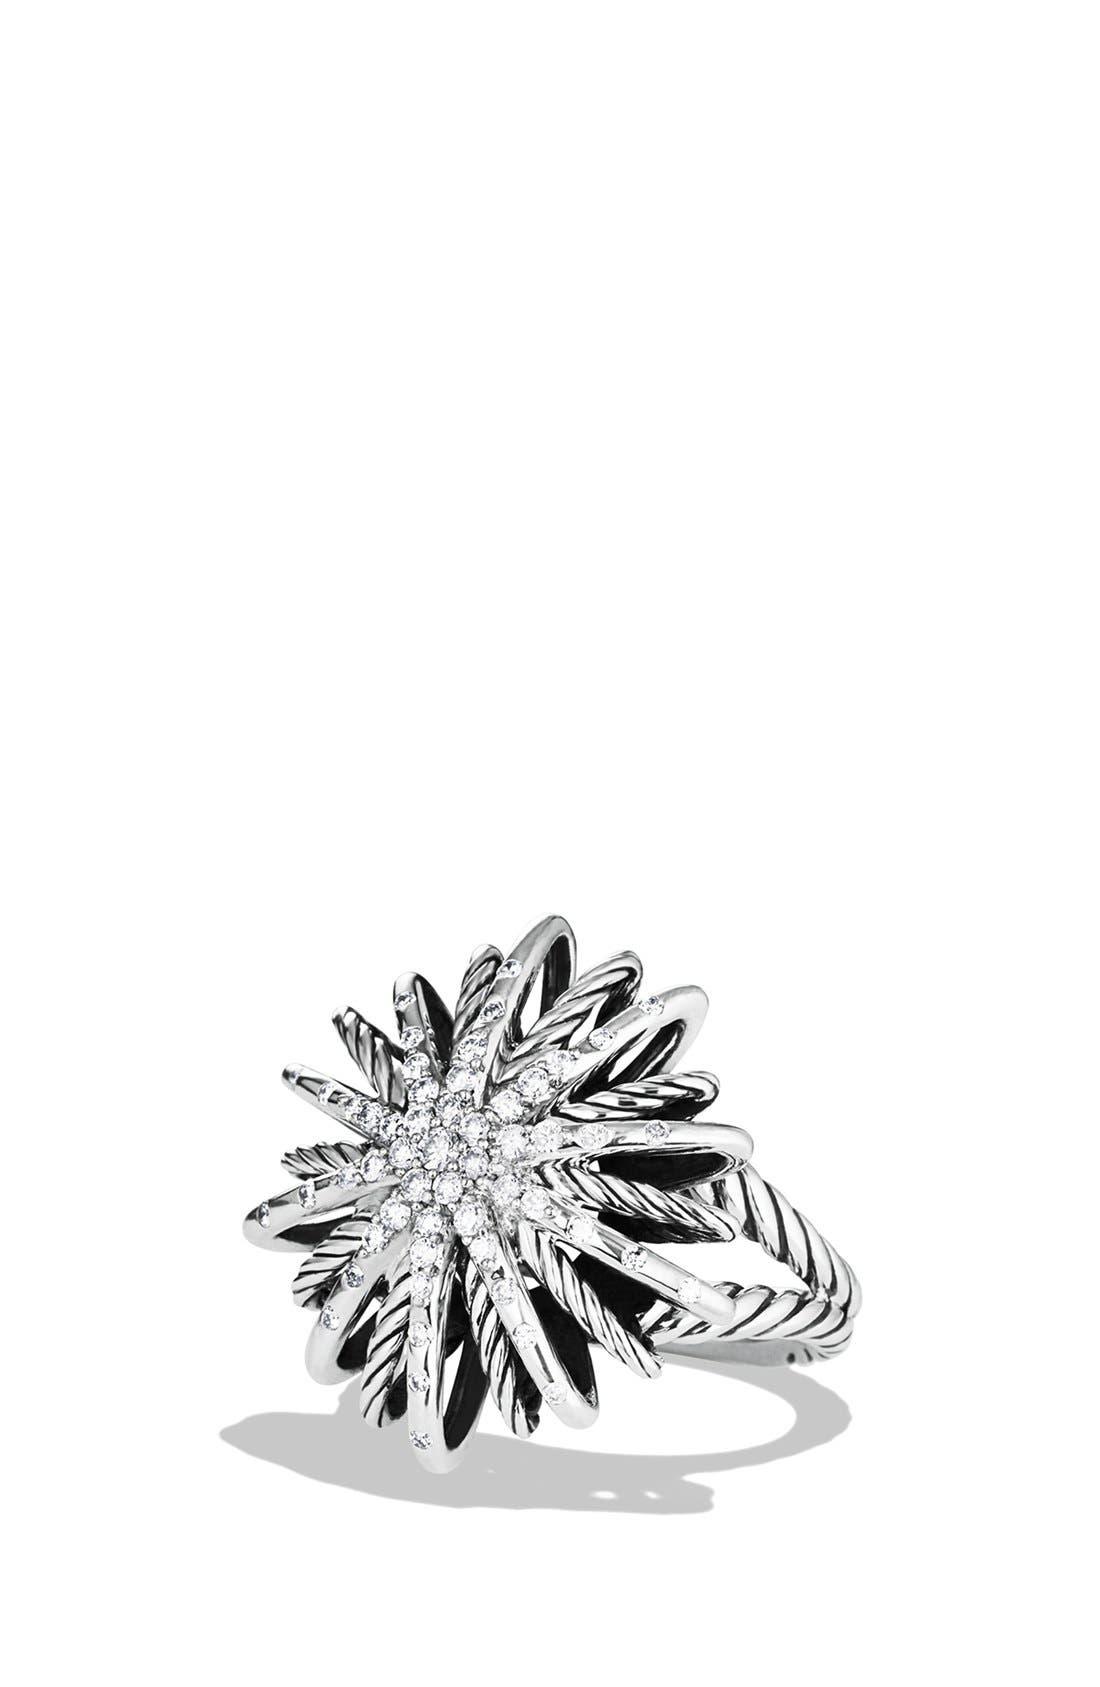 Alternate Image 1 Selected - David Yurman 'Starburst' Ring with Diamonds